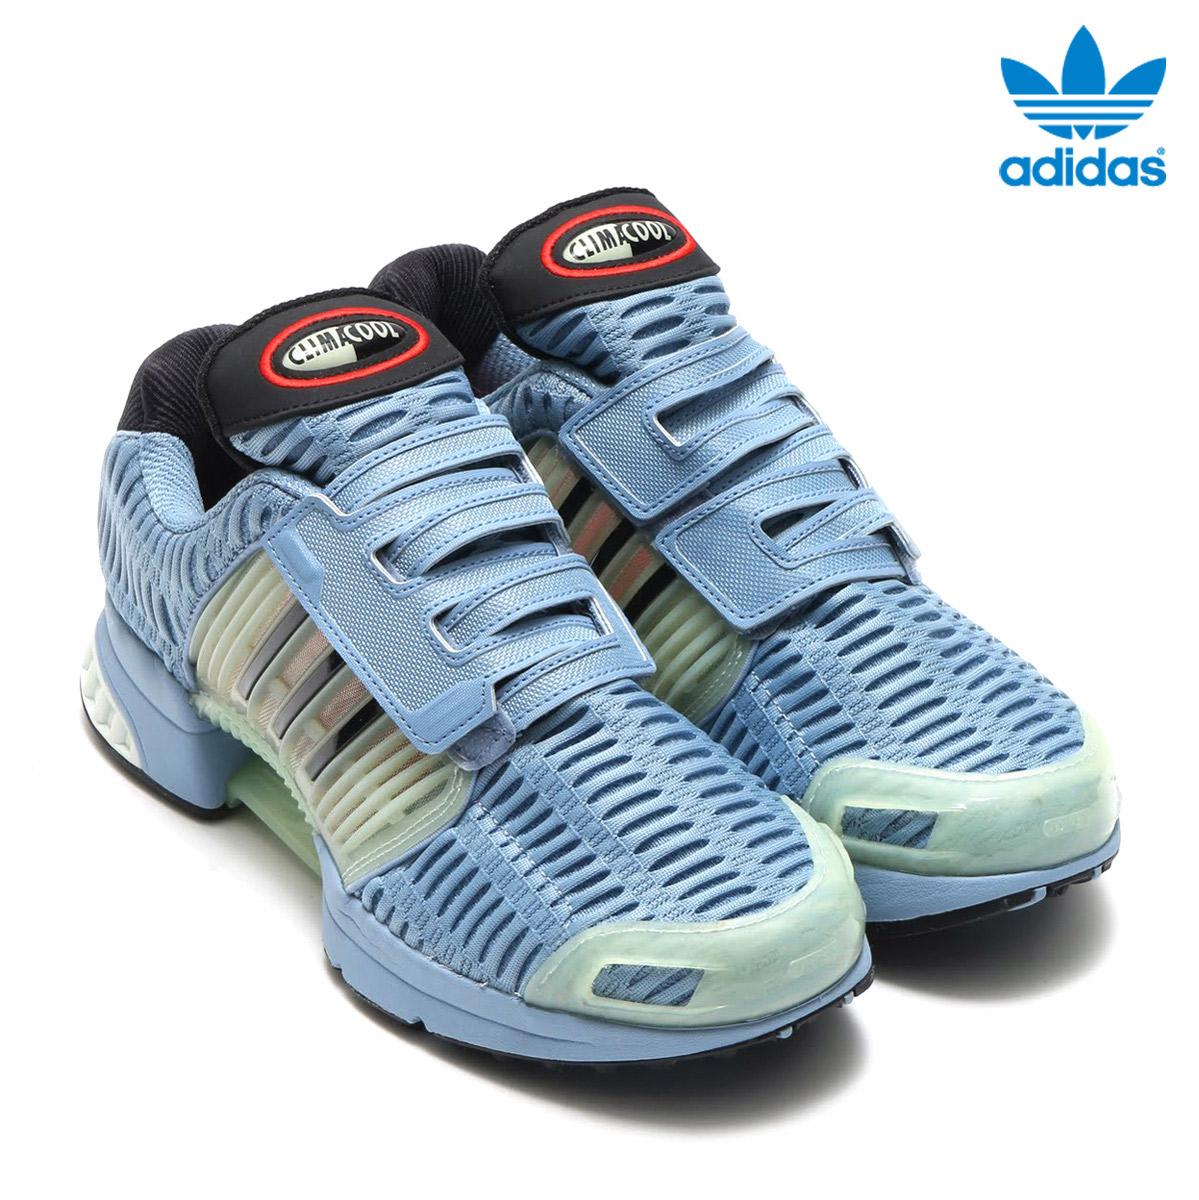 adidas Originals CLIMA COOL 1 CMF(アディダス オリジナルス クライマクール) TACTILE BLUE/CORE BLACK/LINEN BLUE【メンズ スニーカー】17SS-I